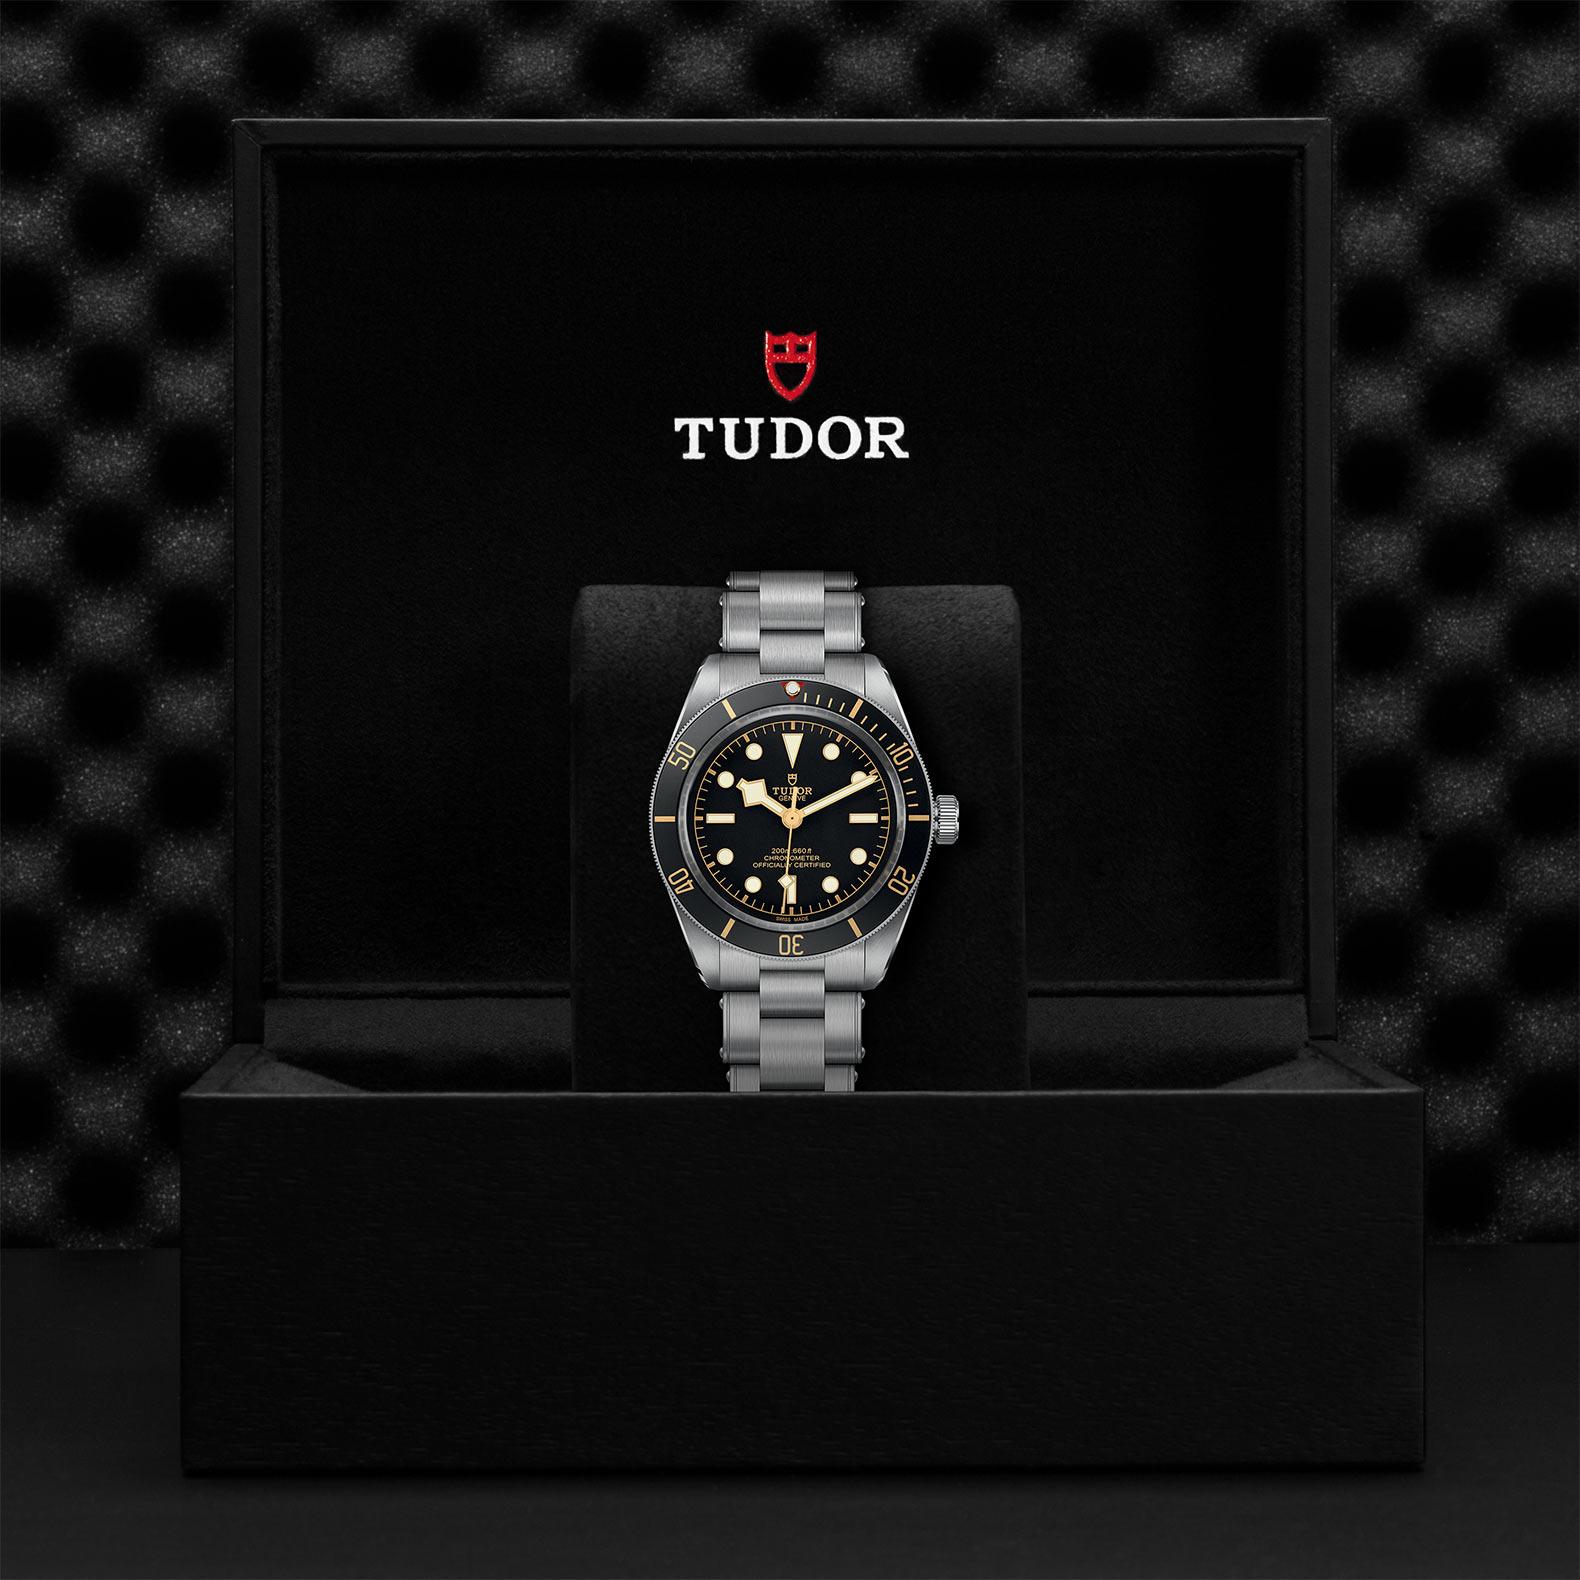 Tudor_M79030n-0001